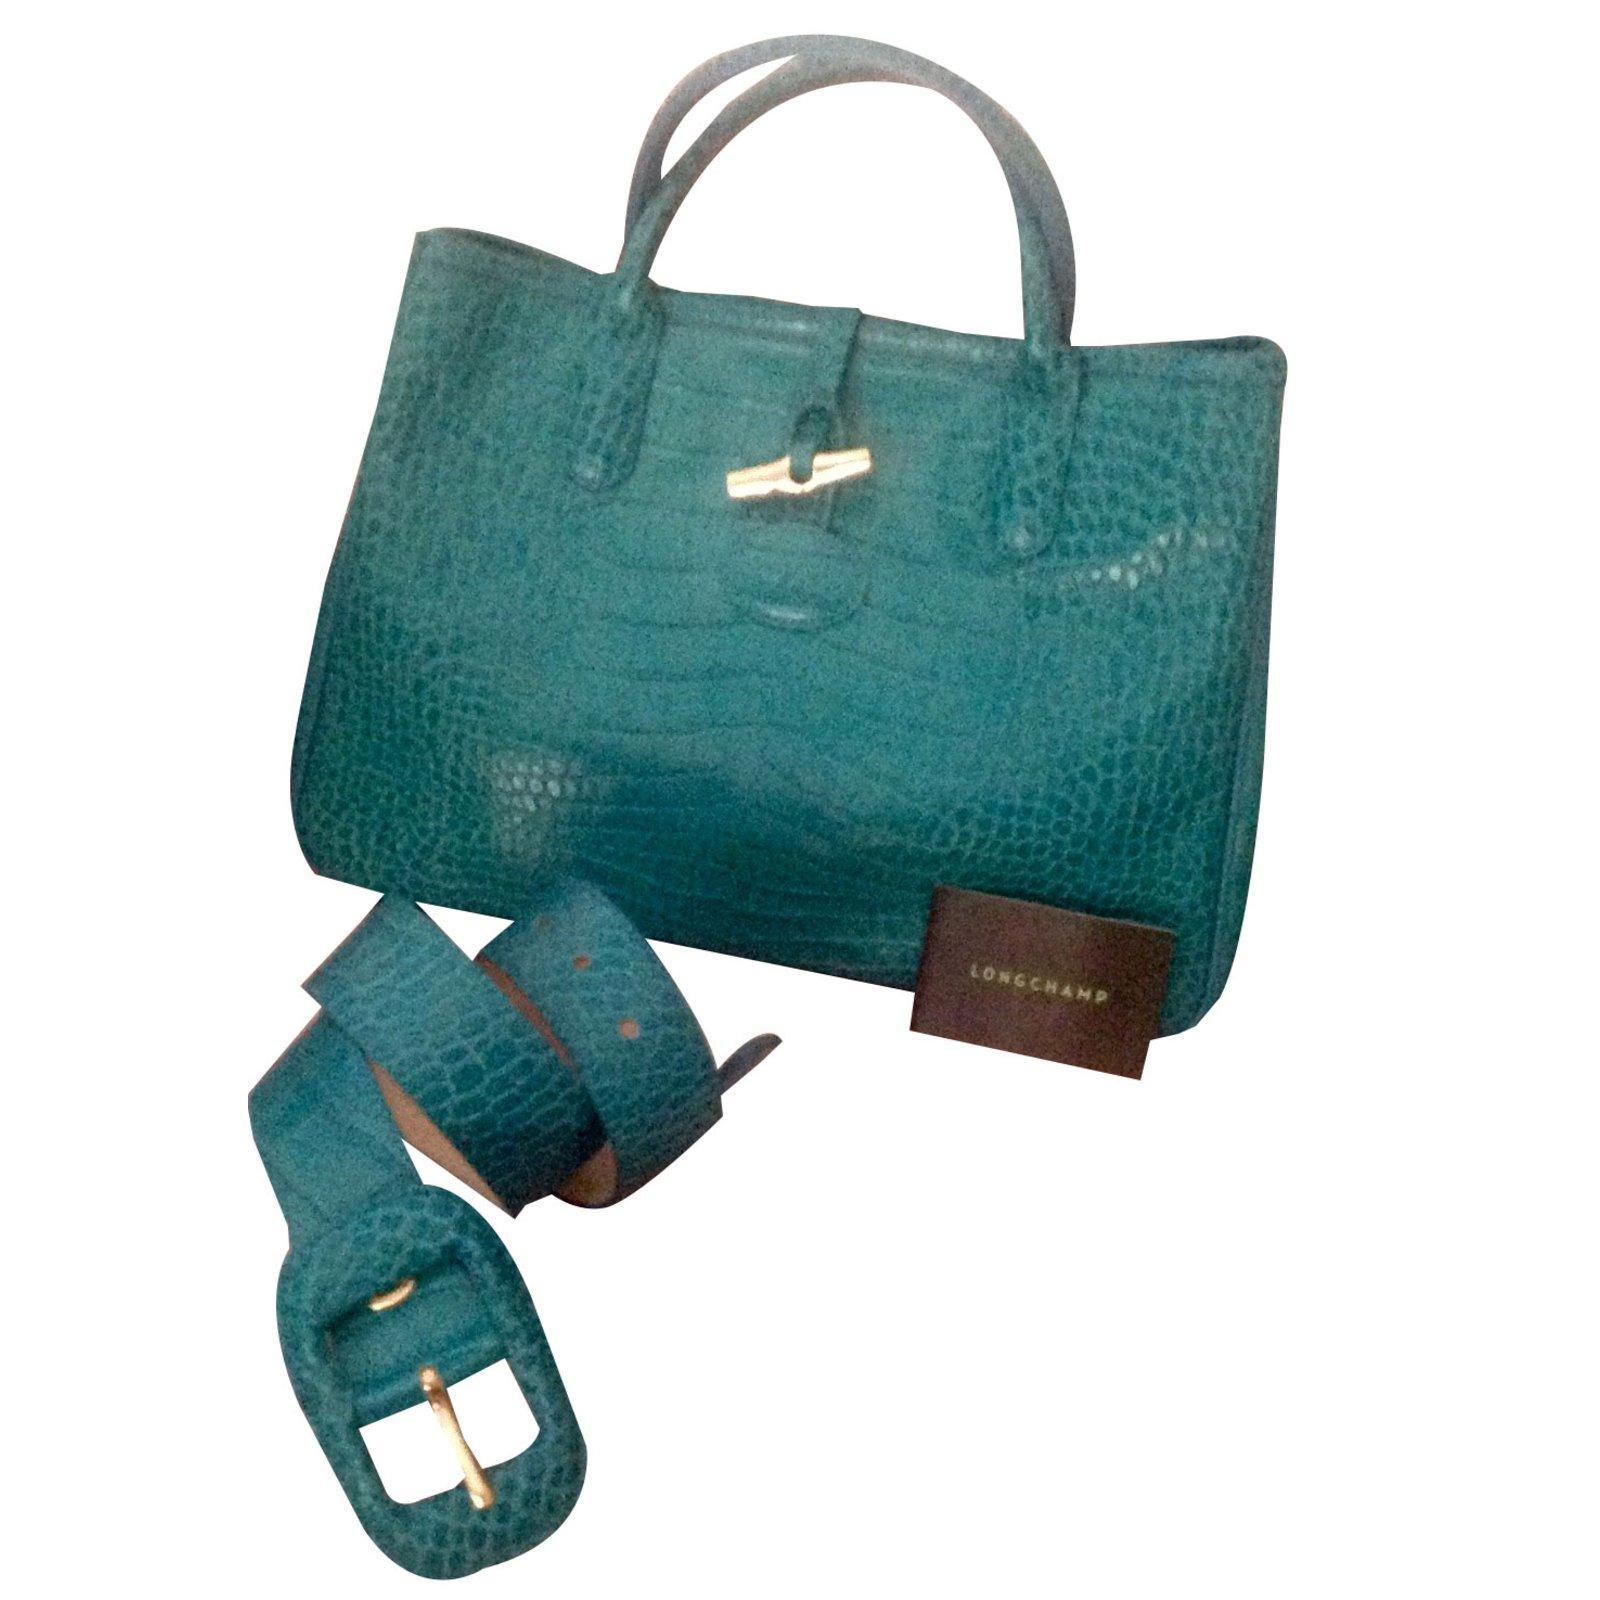 Longchamp Handbags Leather Other Ref 44313